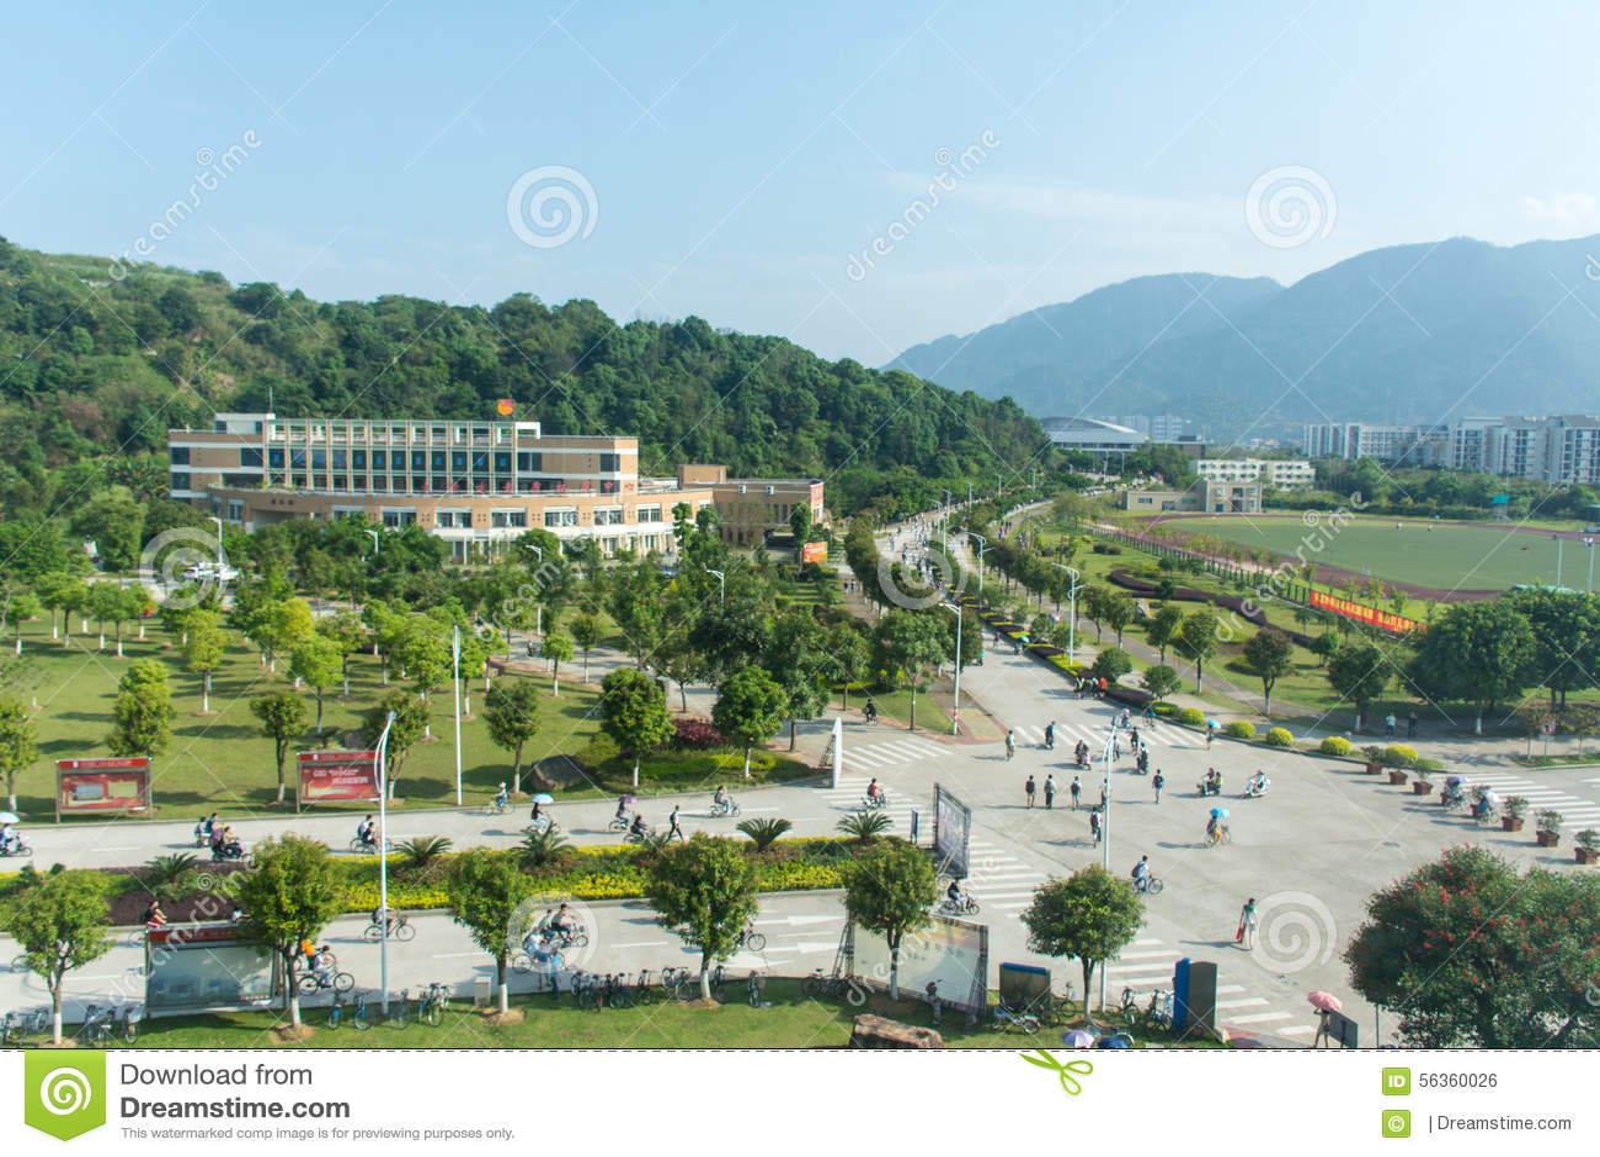 Image result for Fuzhou University